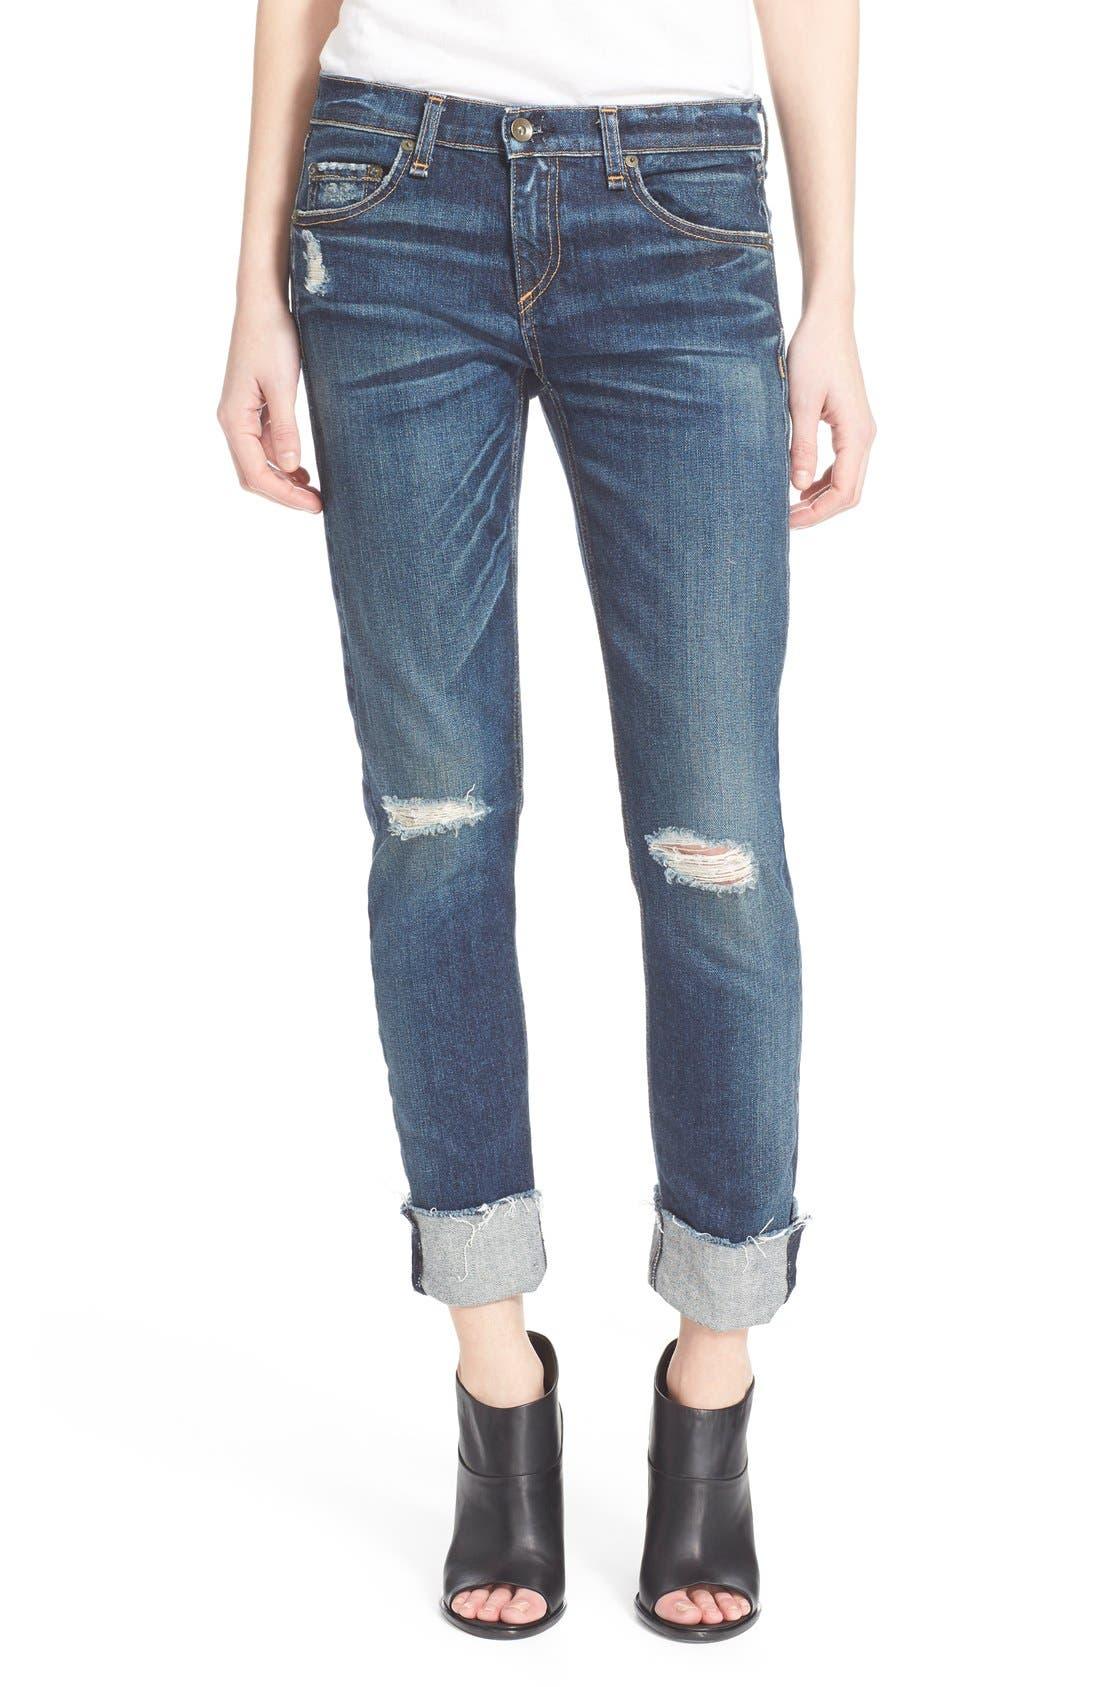 Alternate Image 1 Selected - rag & bone/JEAN 'The Dre' Slim Fit Boyfriend Jeans (Mabel)